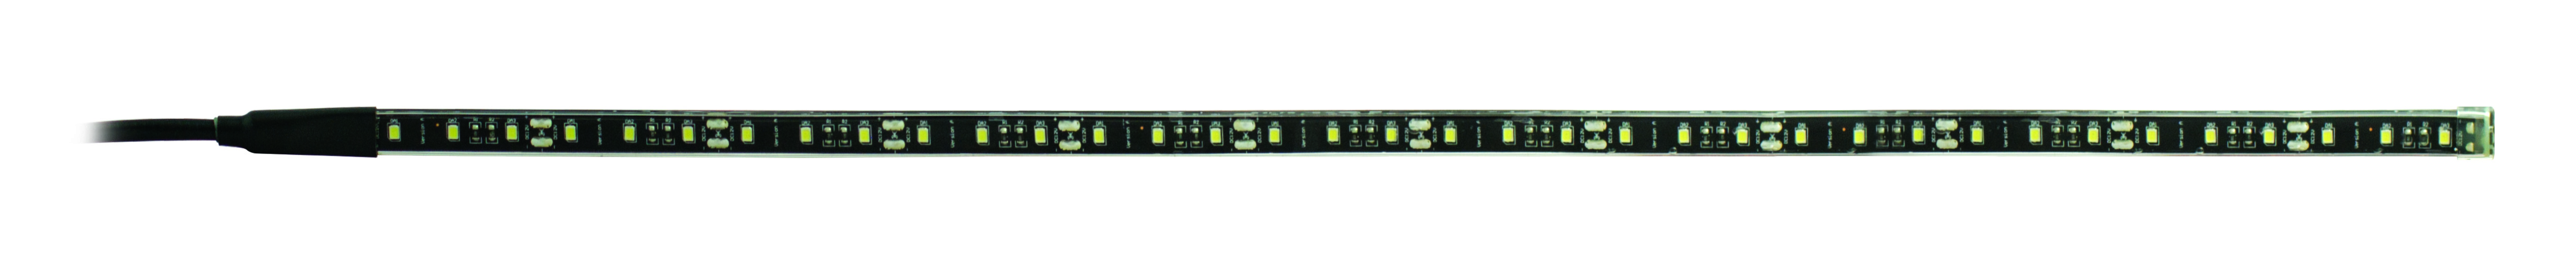 LED Autolamps Flexible interior Strip Lamp